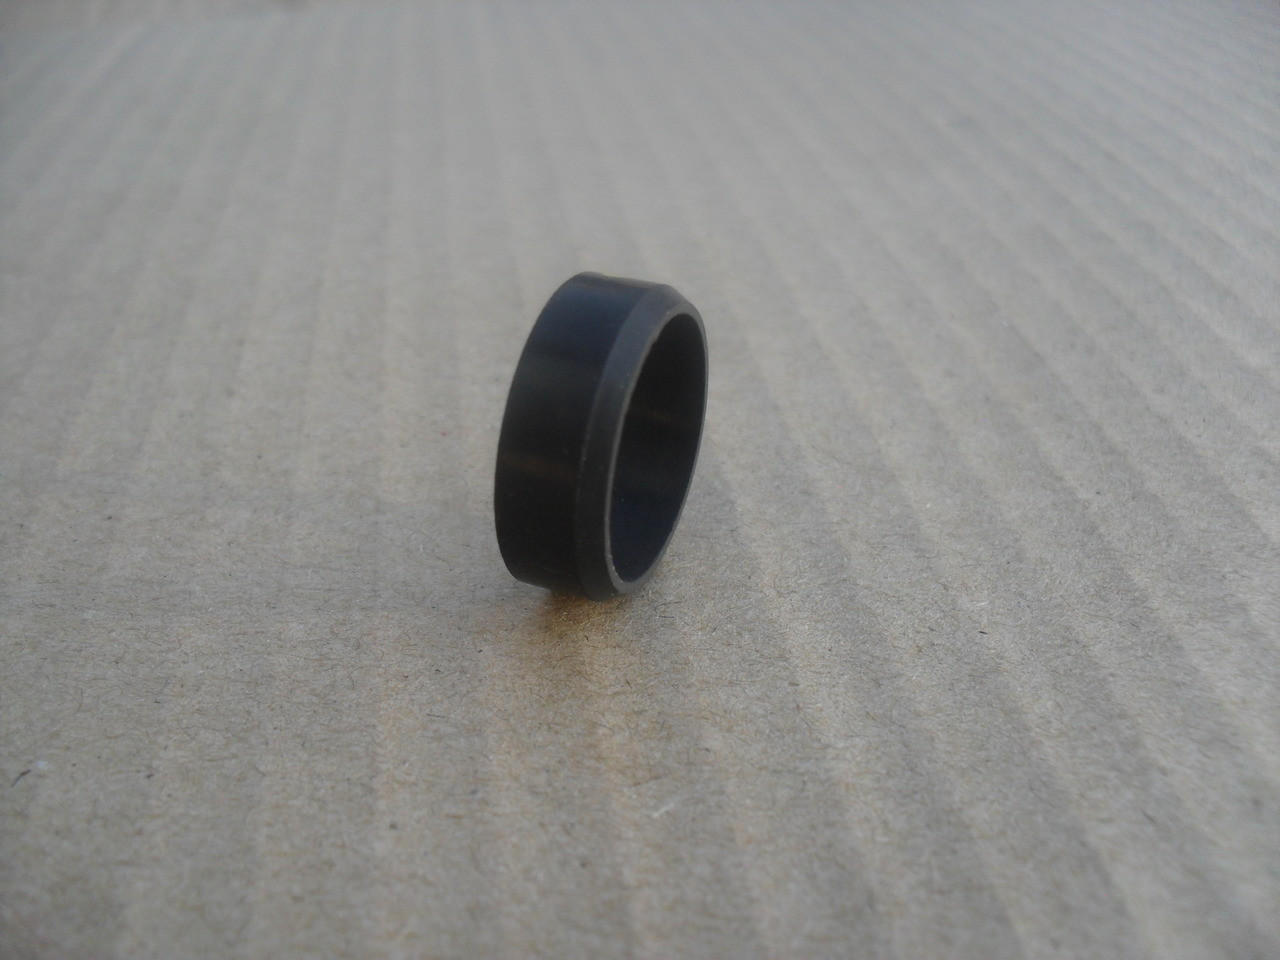 Tecumseh Oil Dipstick Tube O Ring 37610, 36966, Made In USA